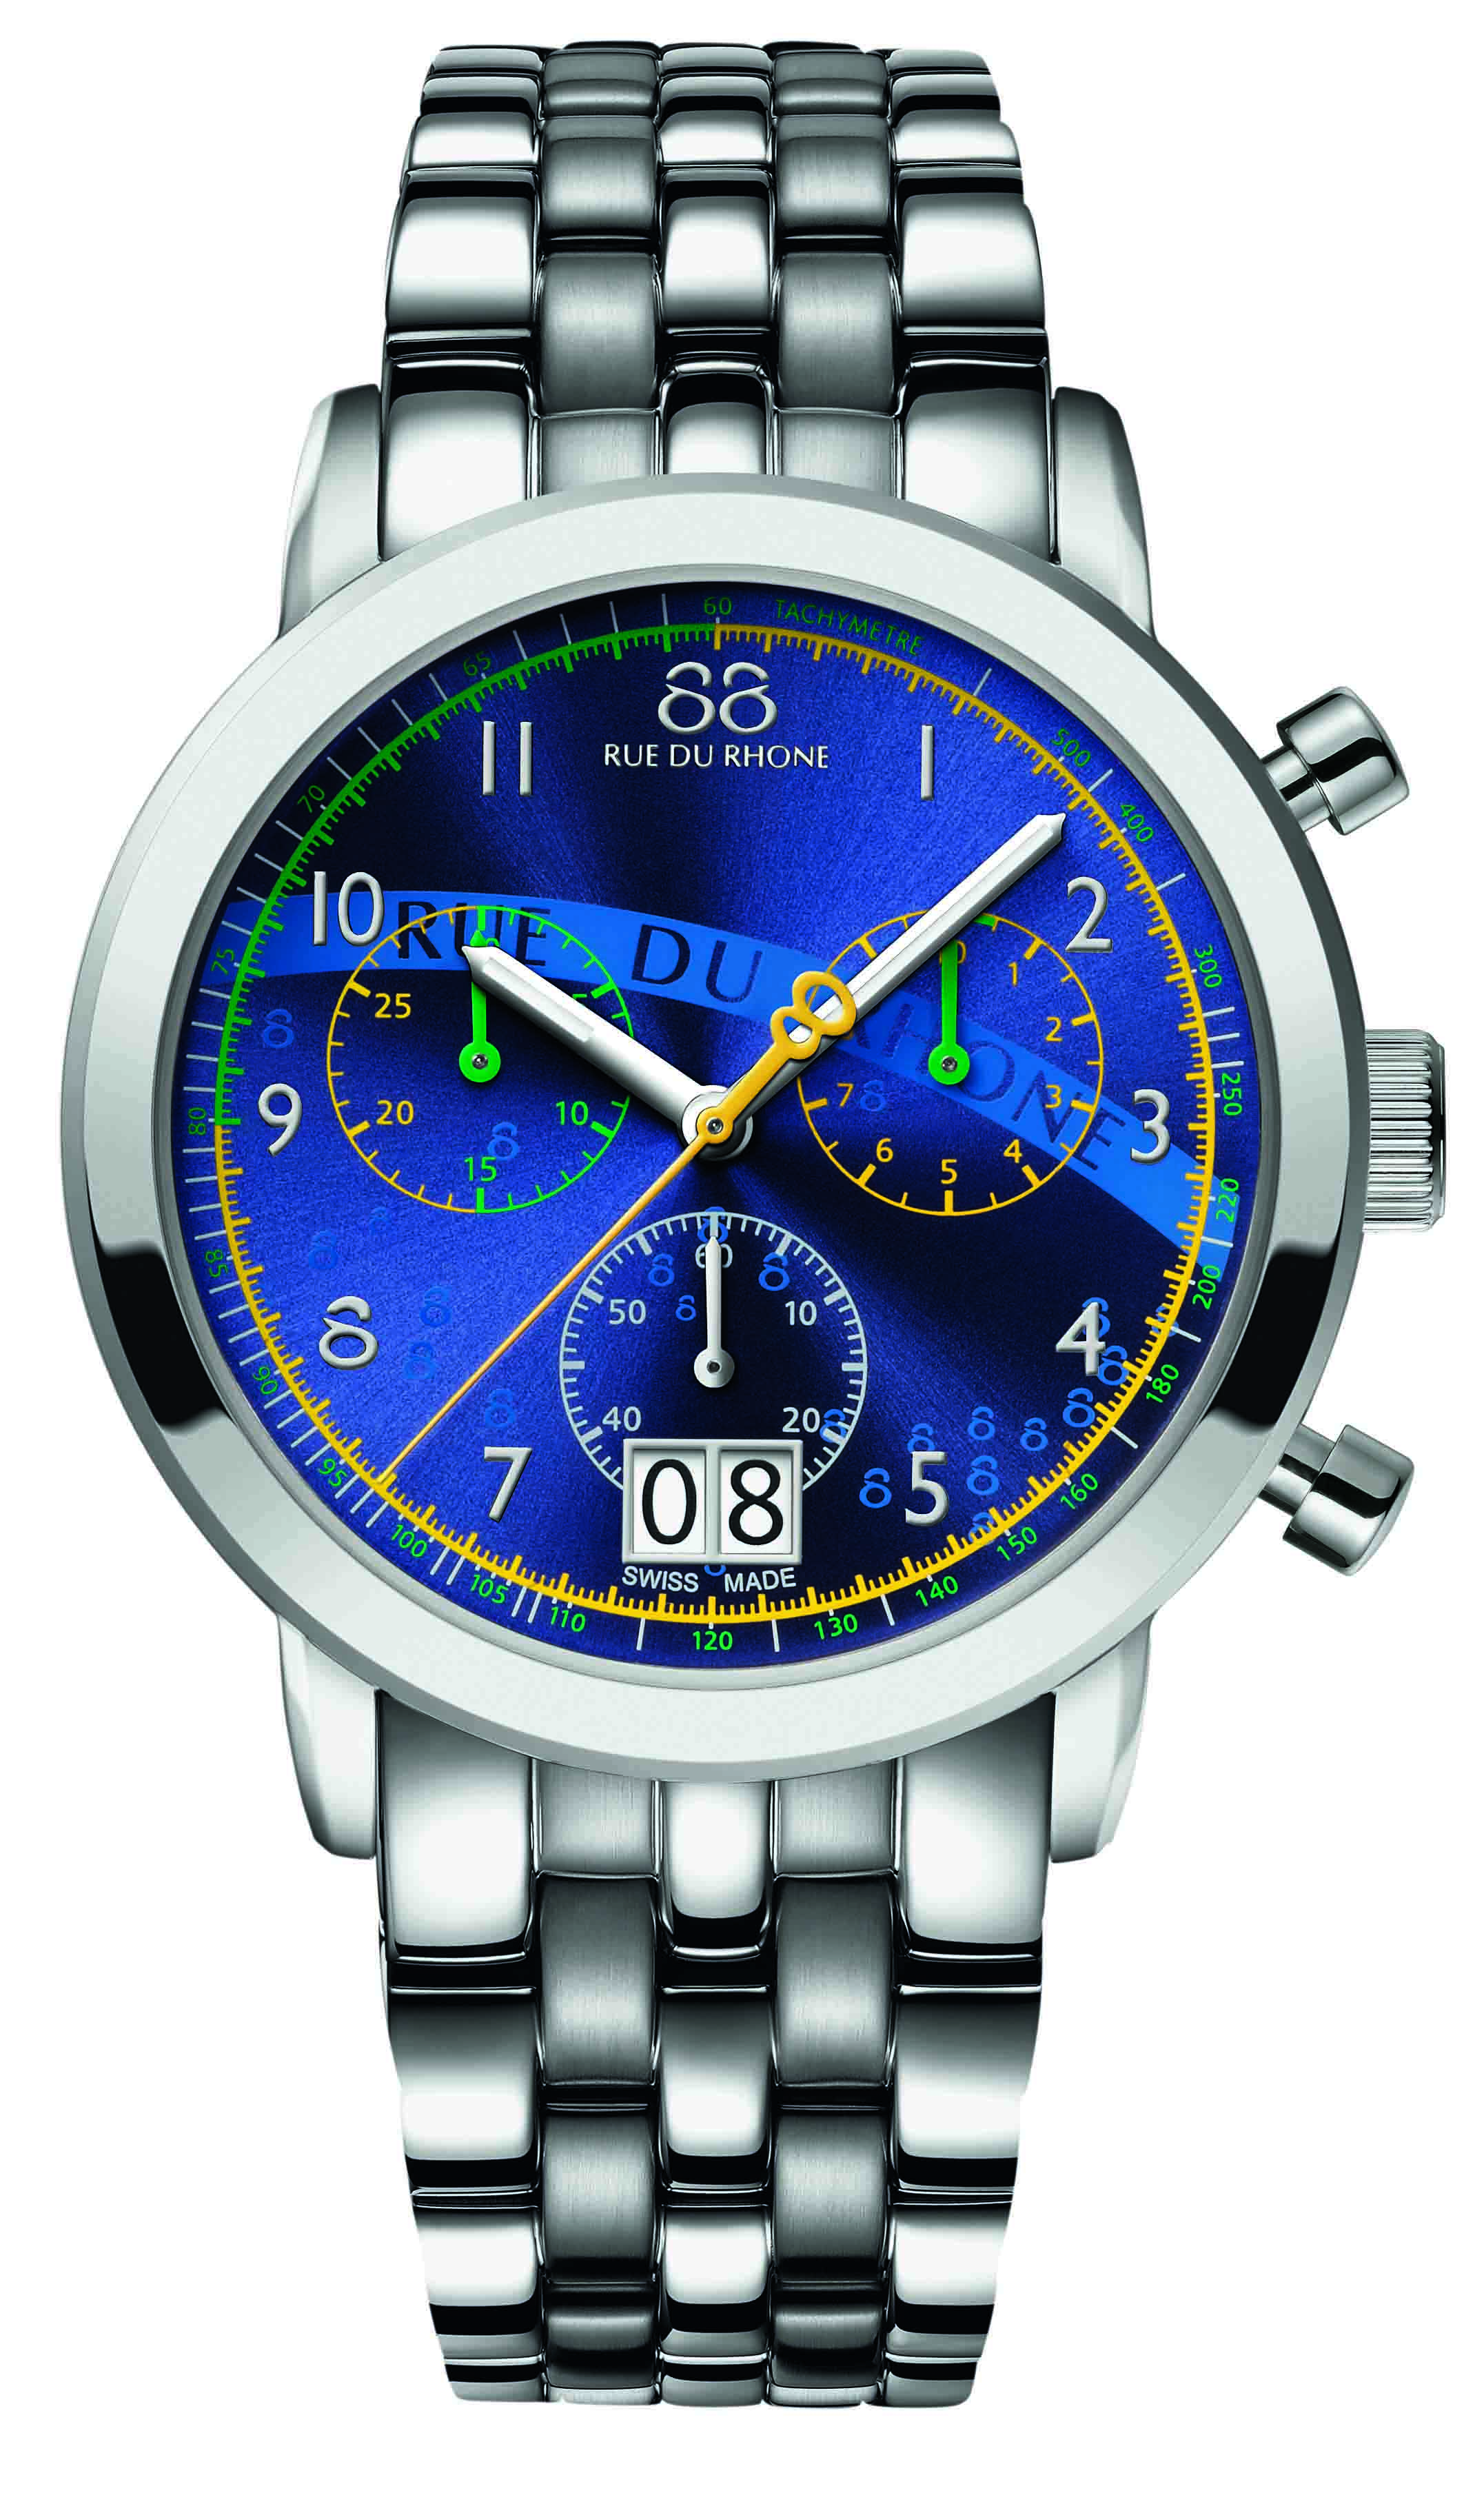 88 Rue Du Rhone:  The Rio watch.